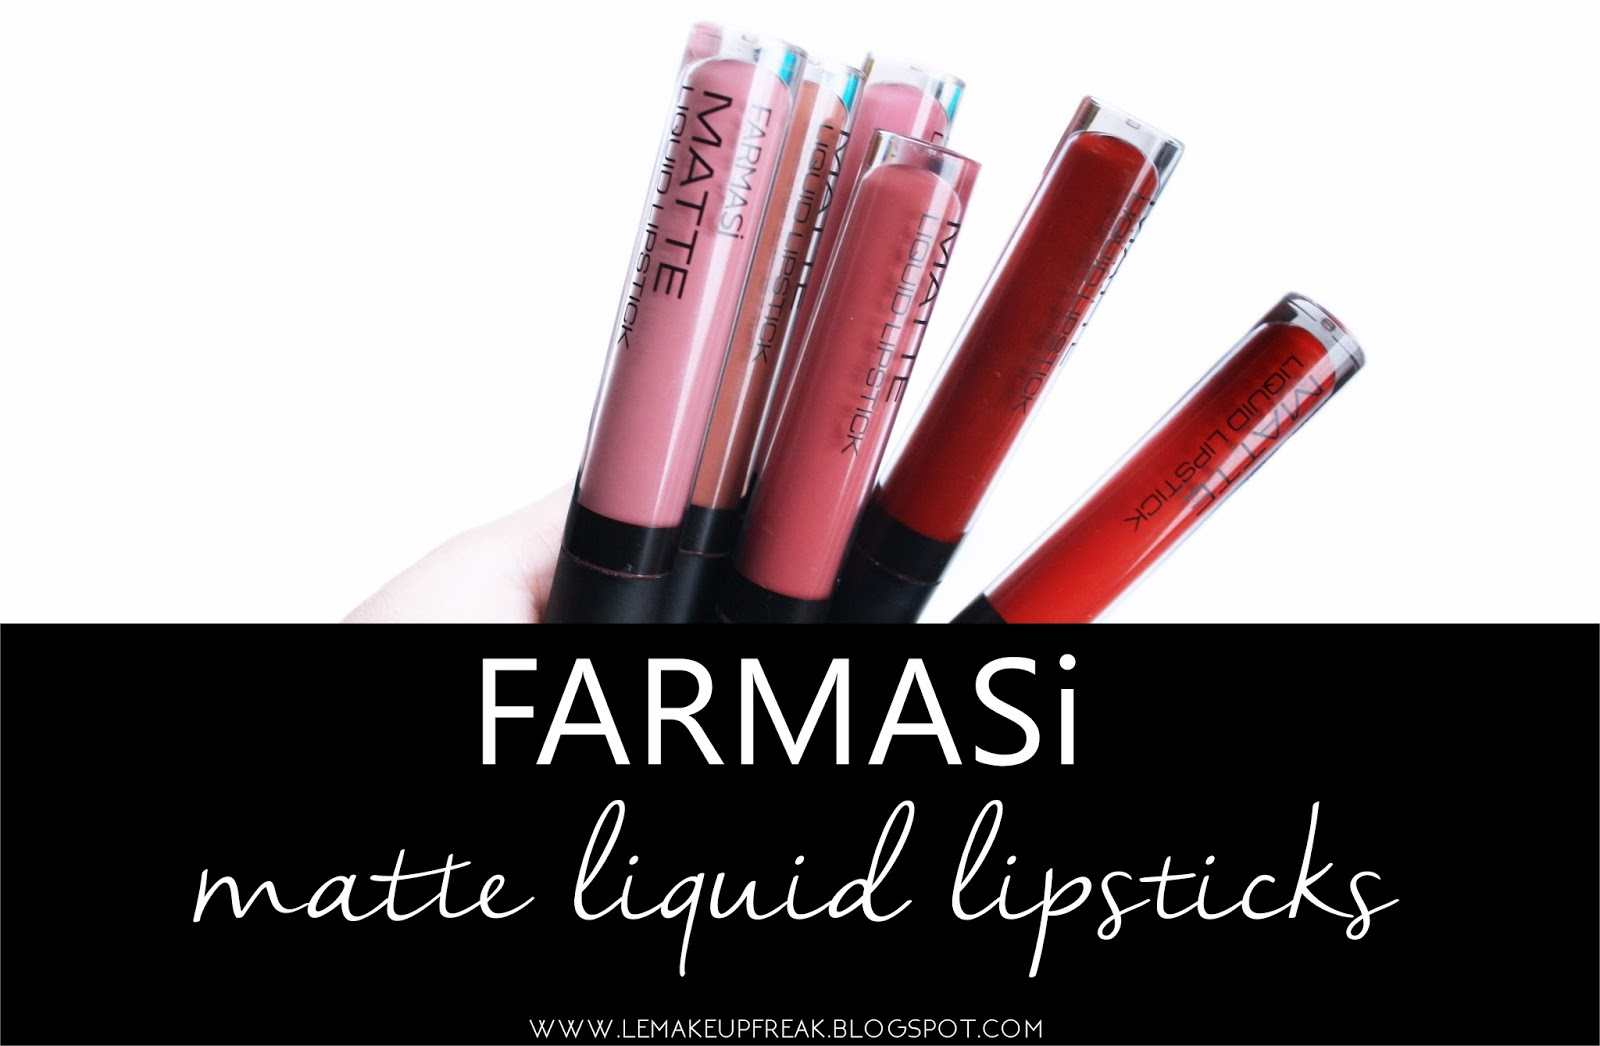 FARMASI Matte Liquid Lipsticks | Le Makeup Freak